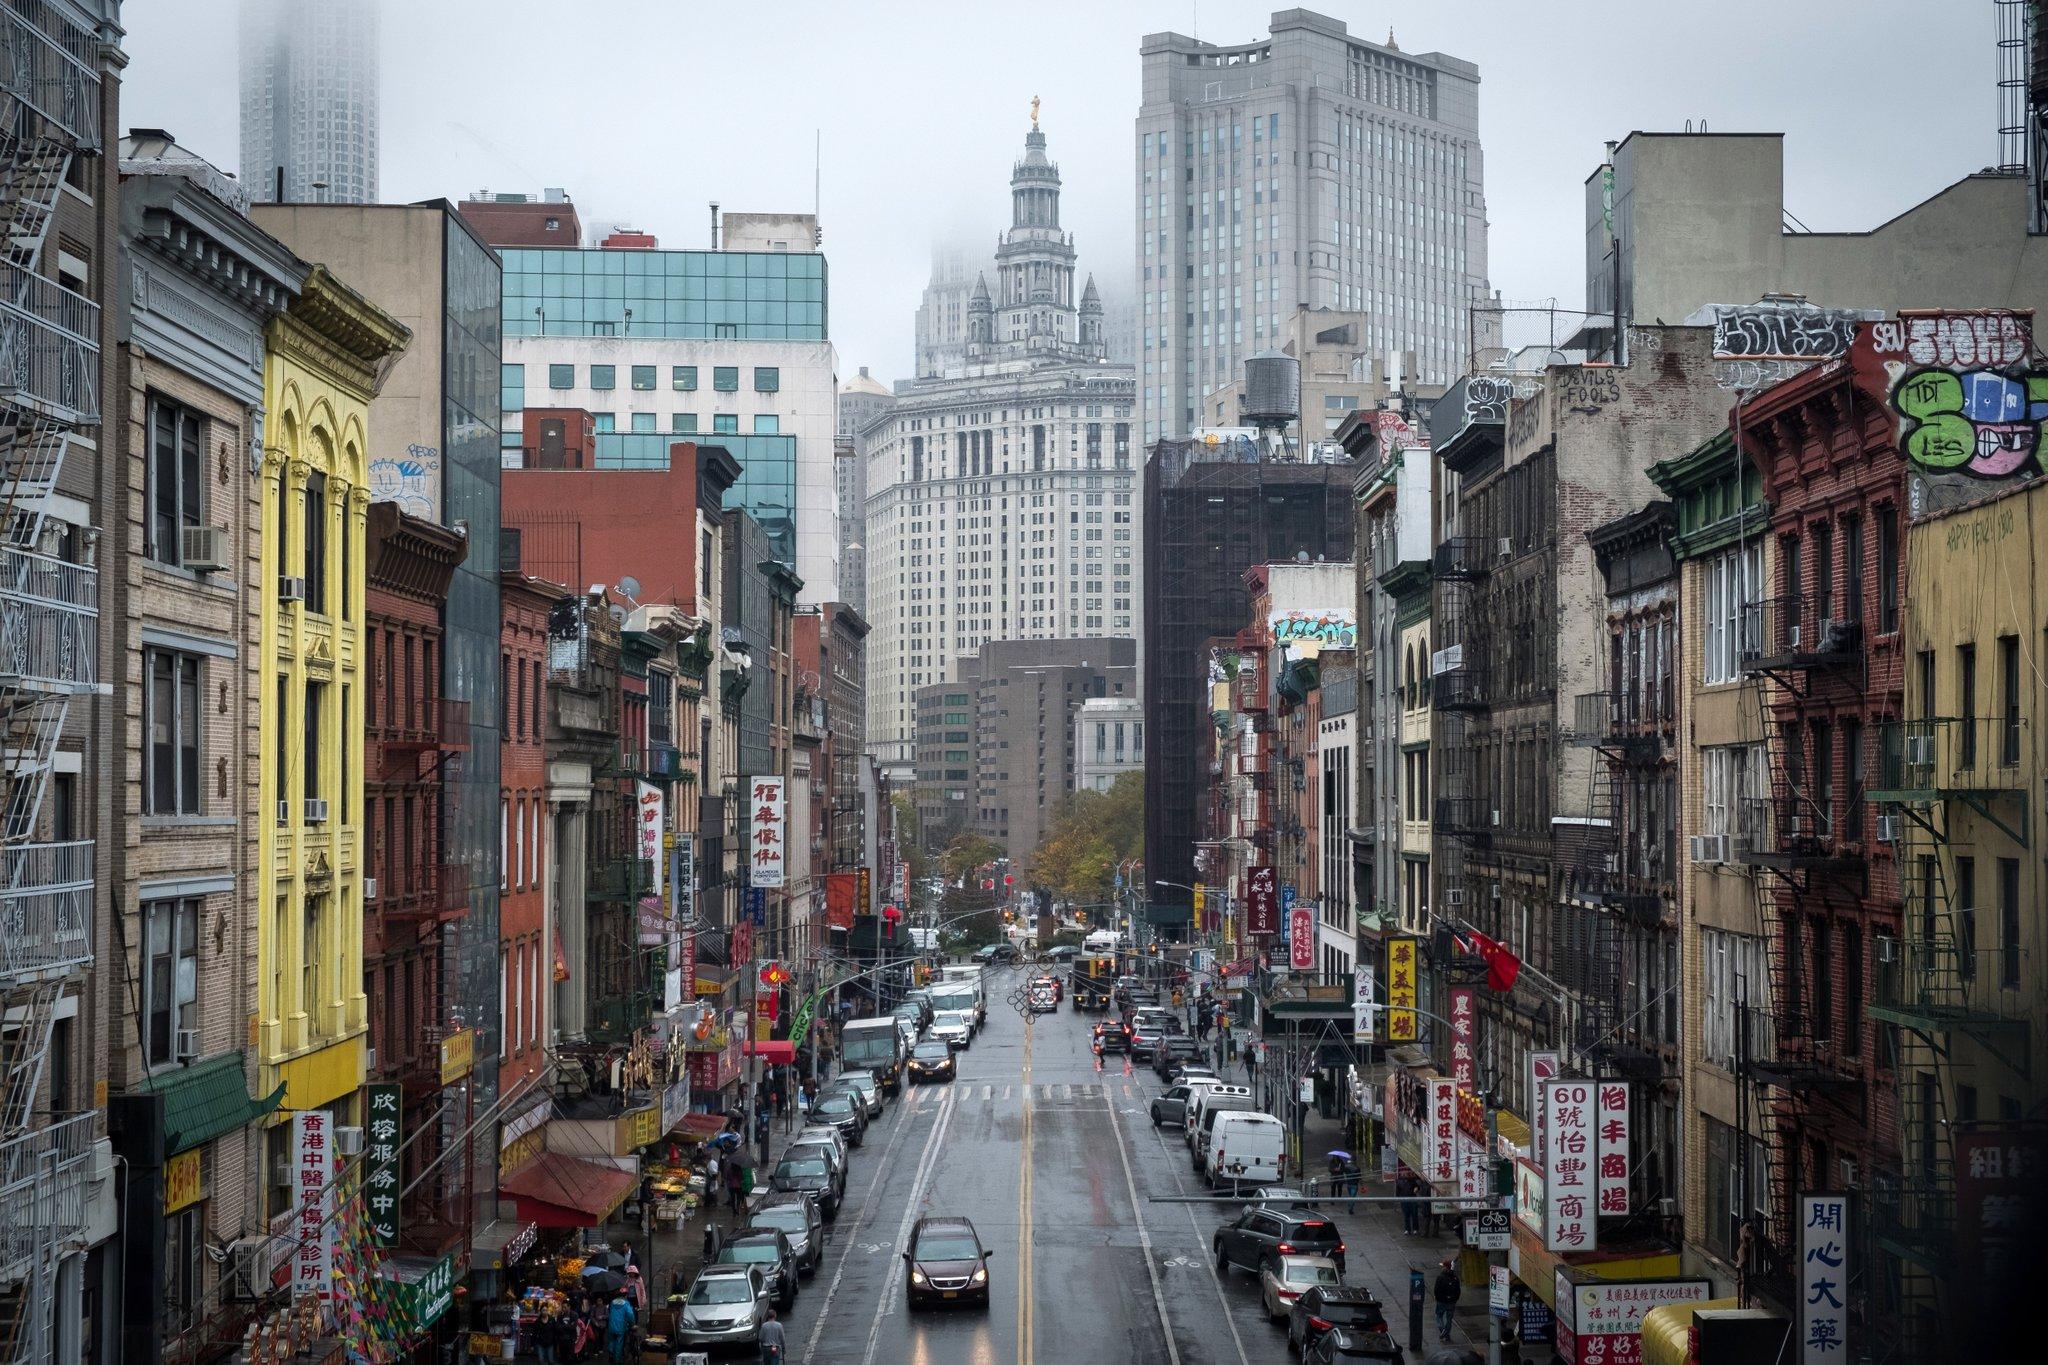 Rainy start to the week in New York City. https://t.co/BWSw4WiQ05